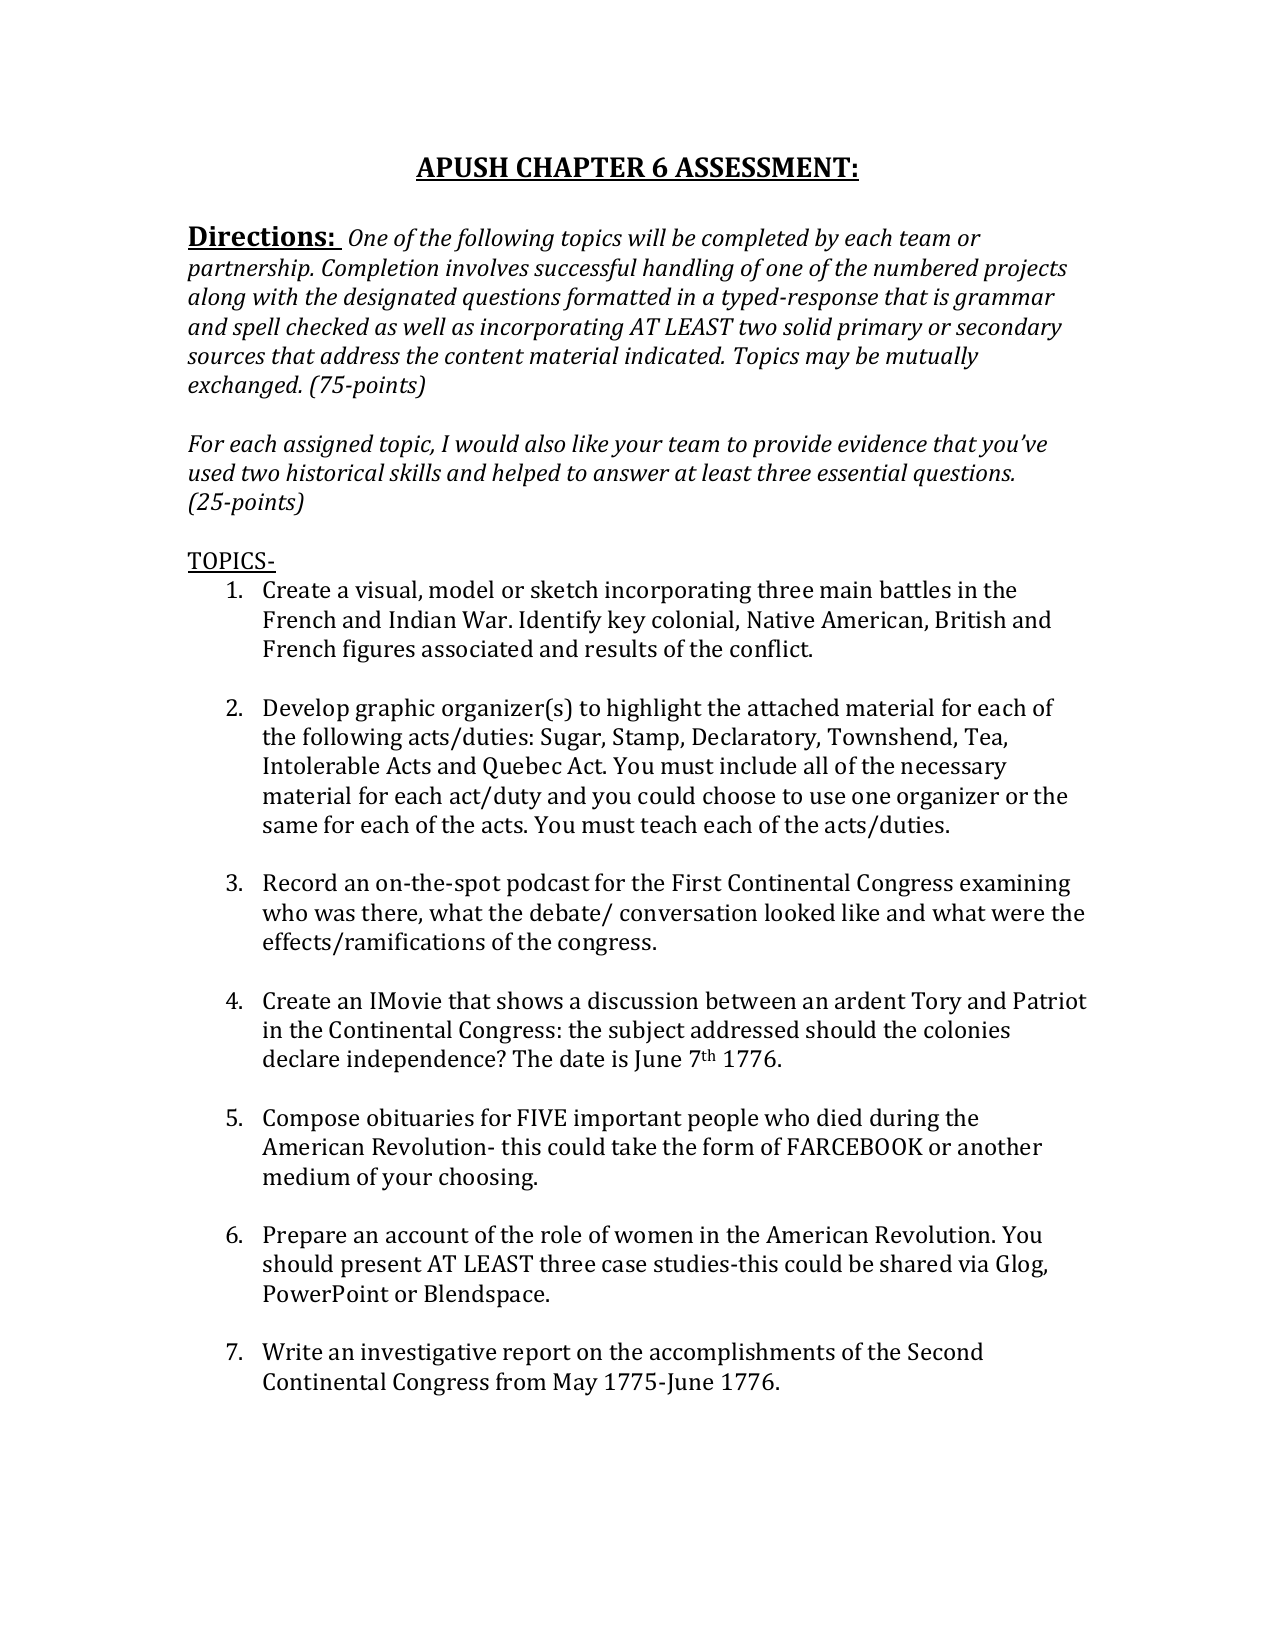 Apush essay questions